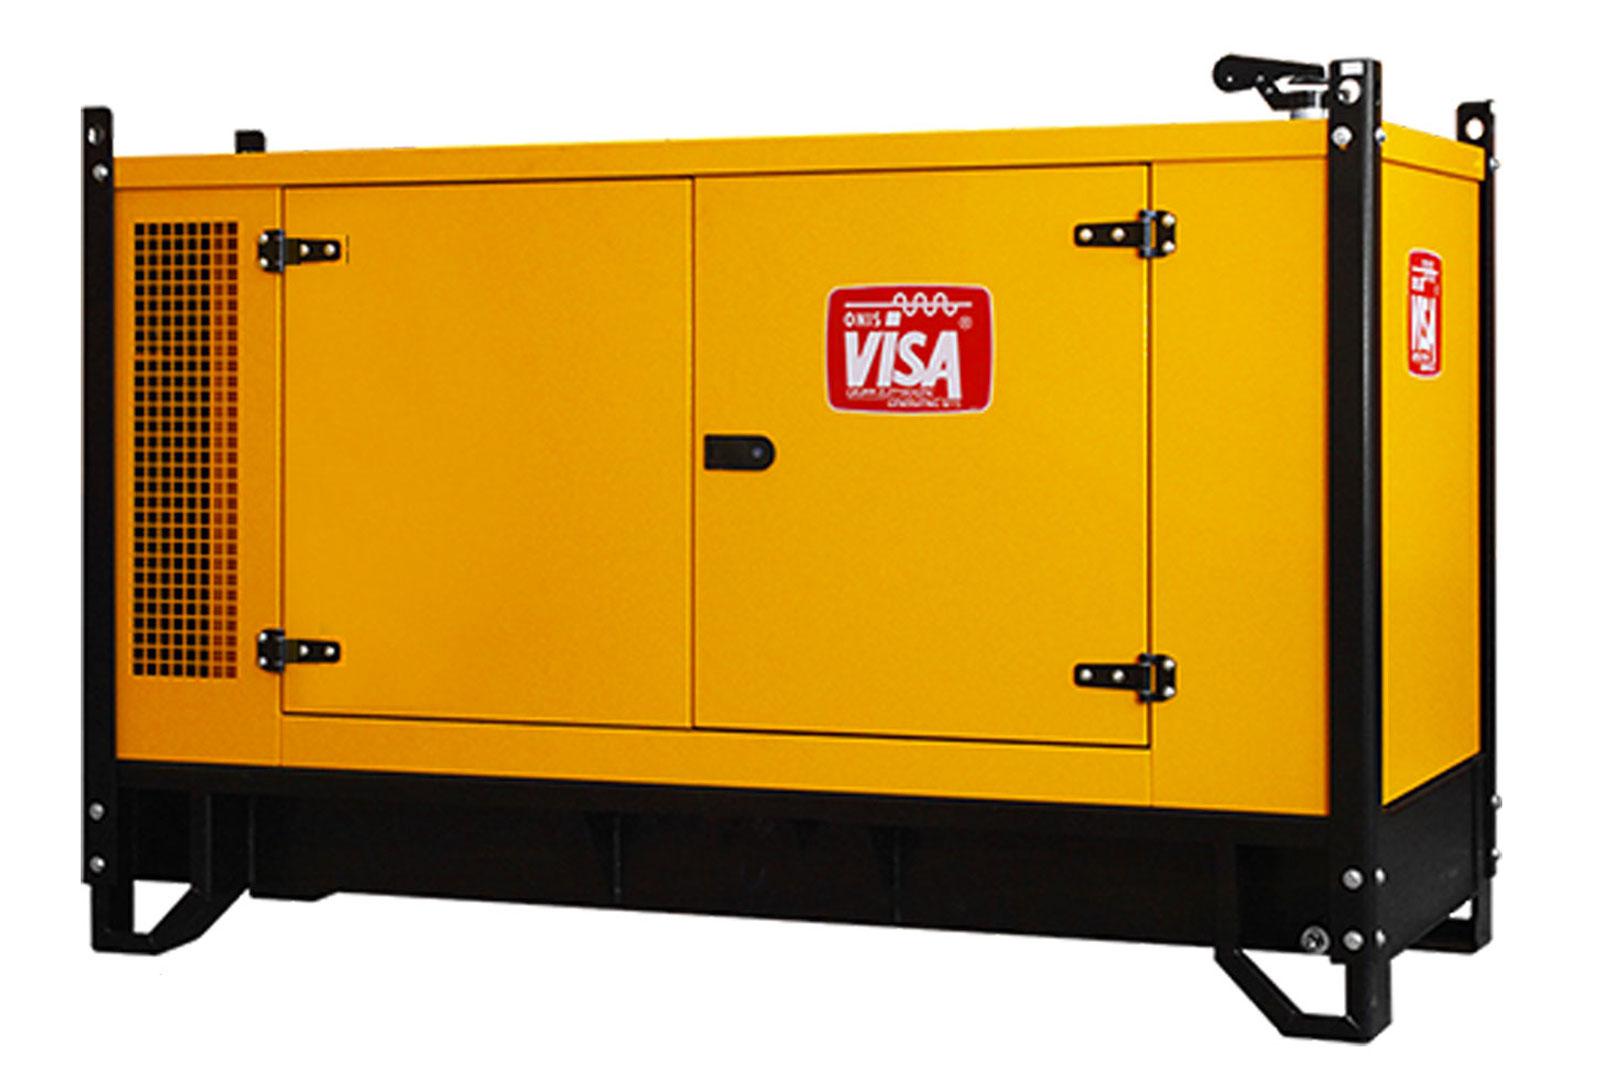 Deutz d21fox diesel generators - Diesel generators pros and cons ...